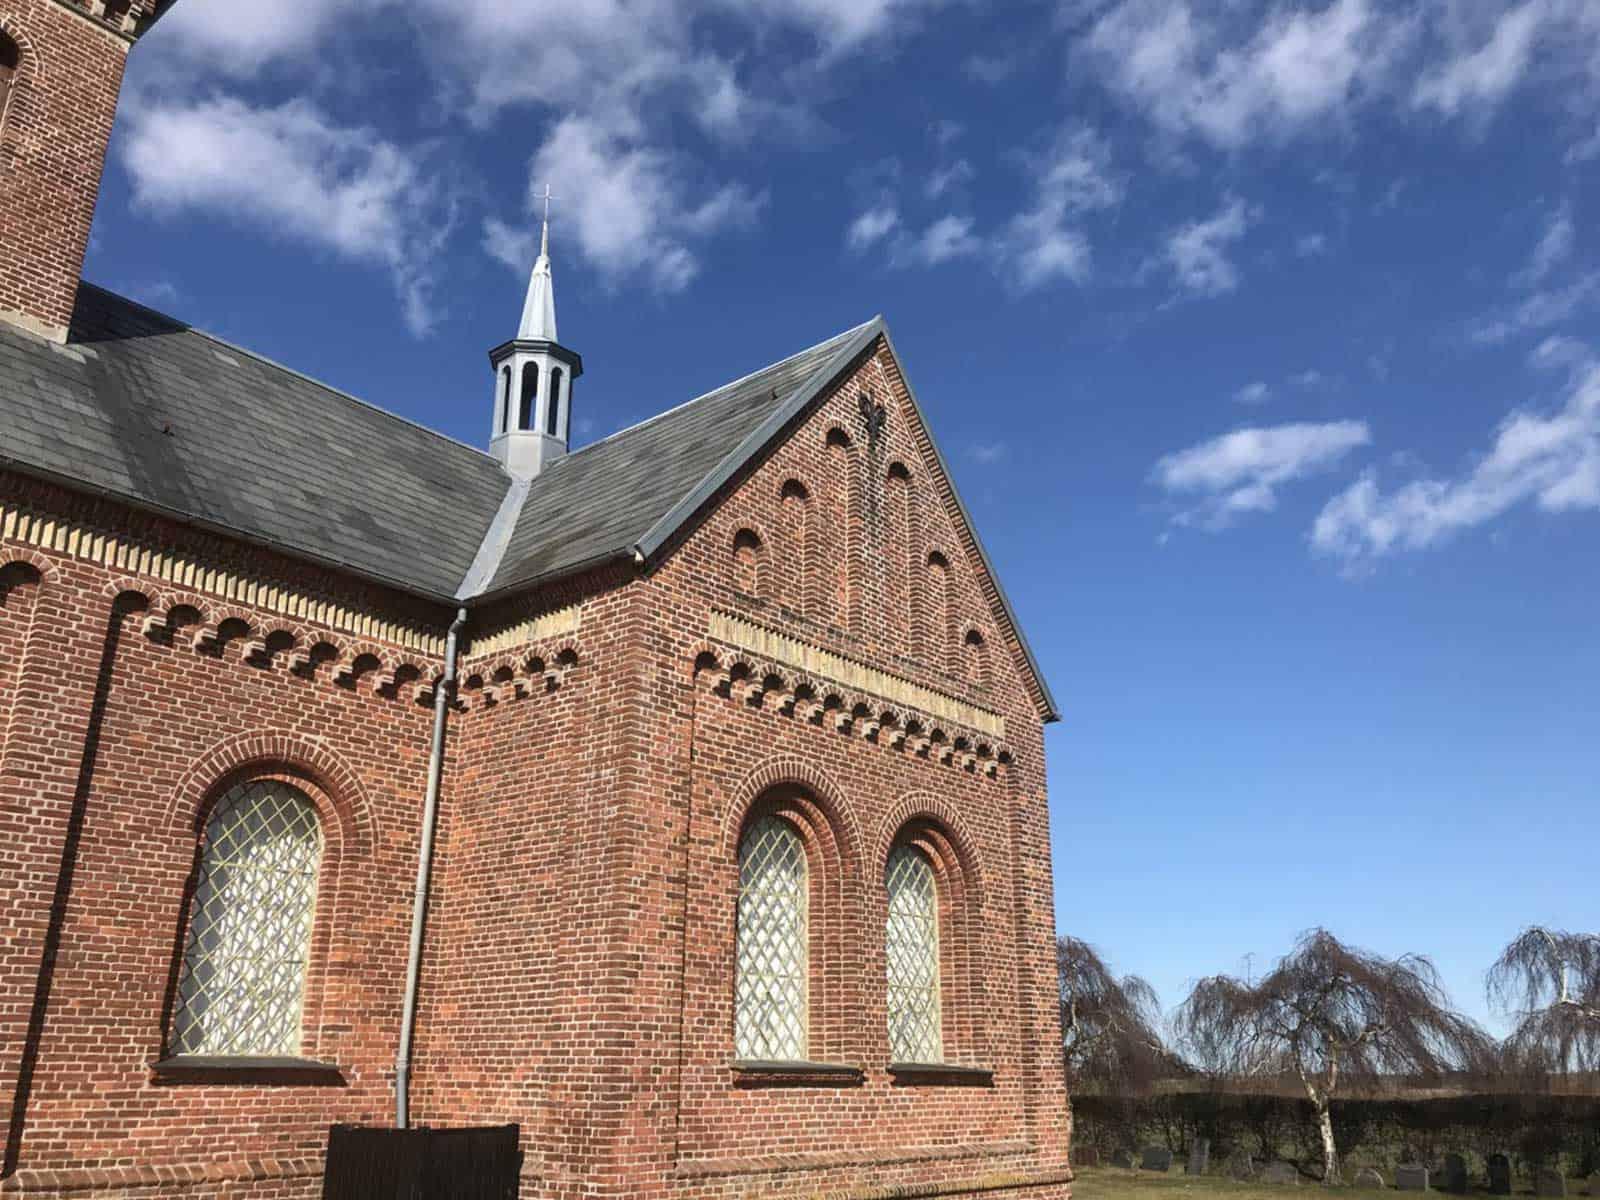 Ristinge Kirke spir